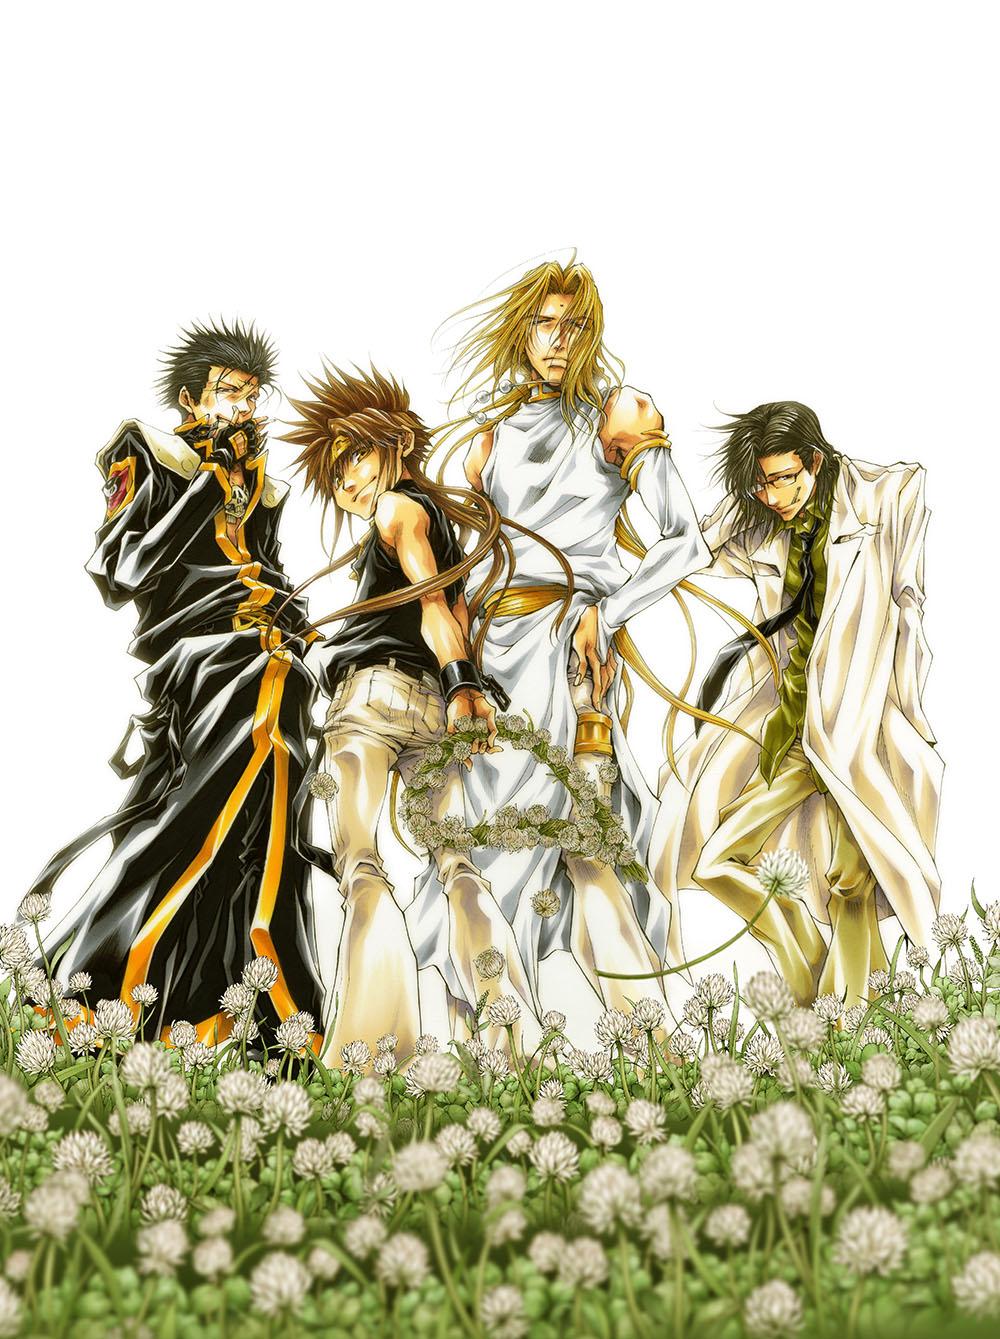 Saiyuki Gaiden Image 2262915 Zerochan Anime Image Board